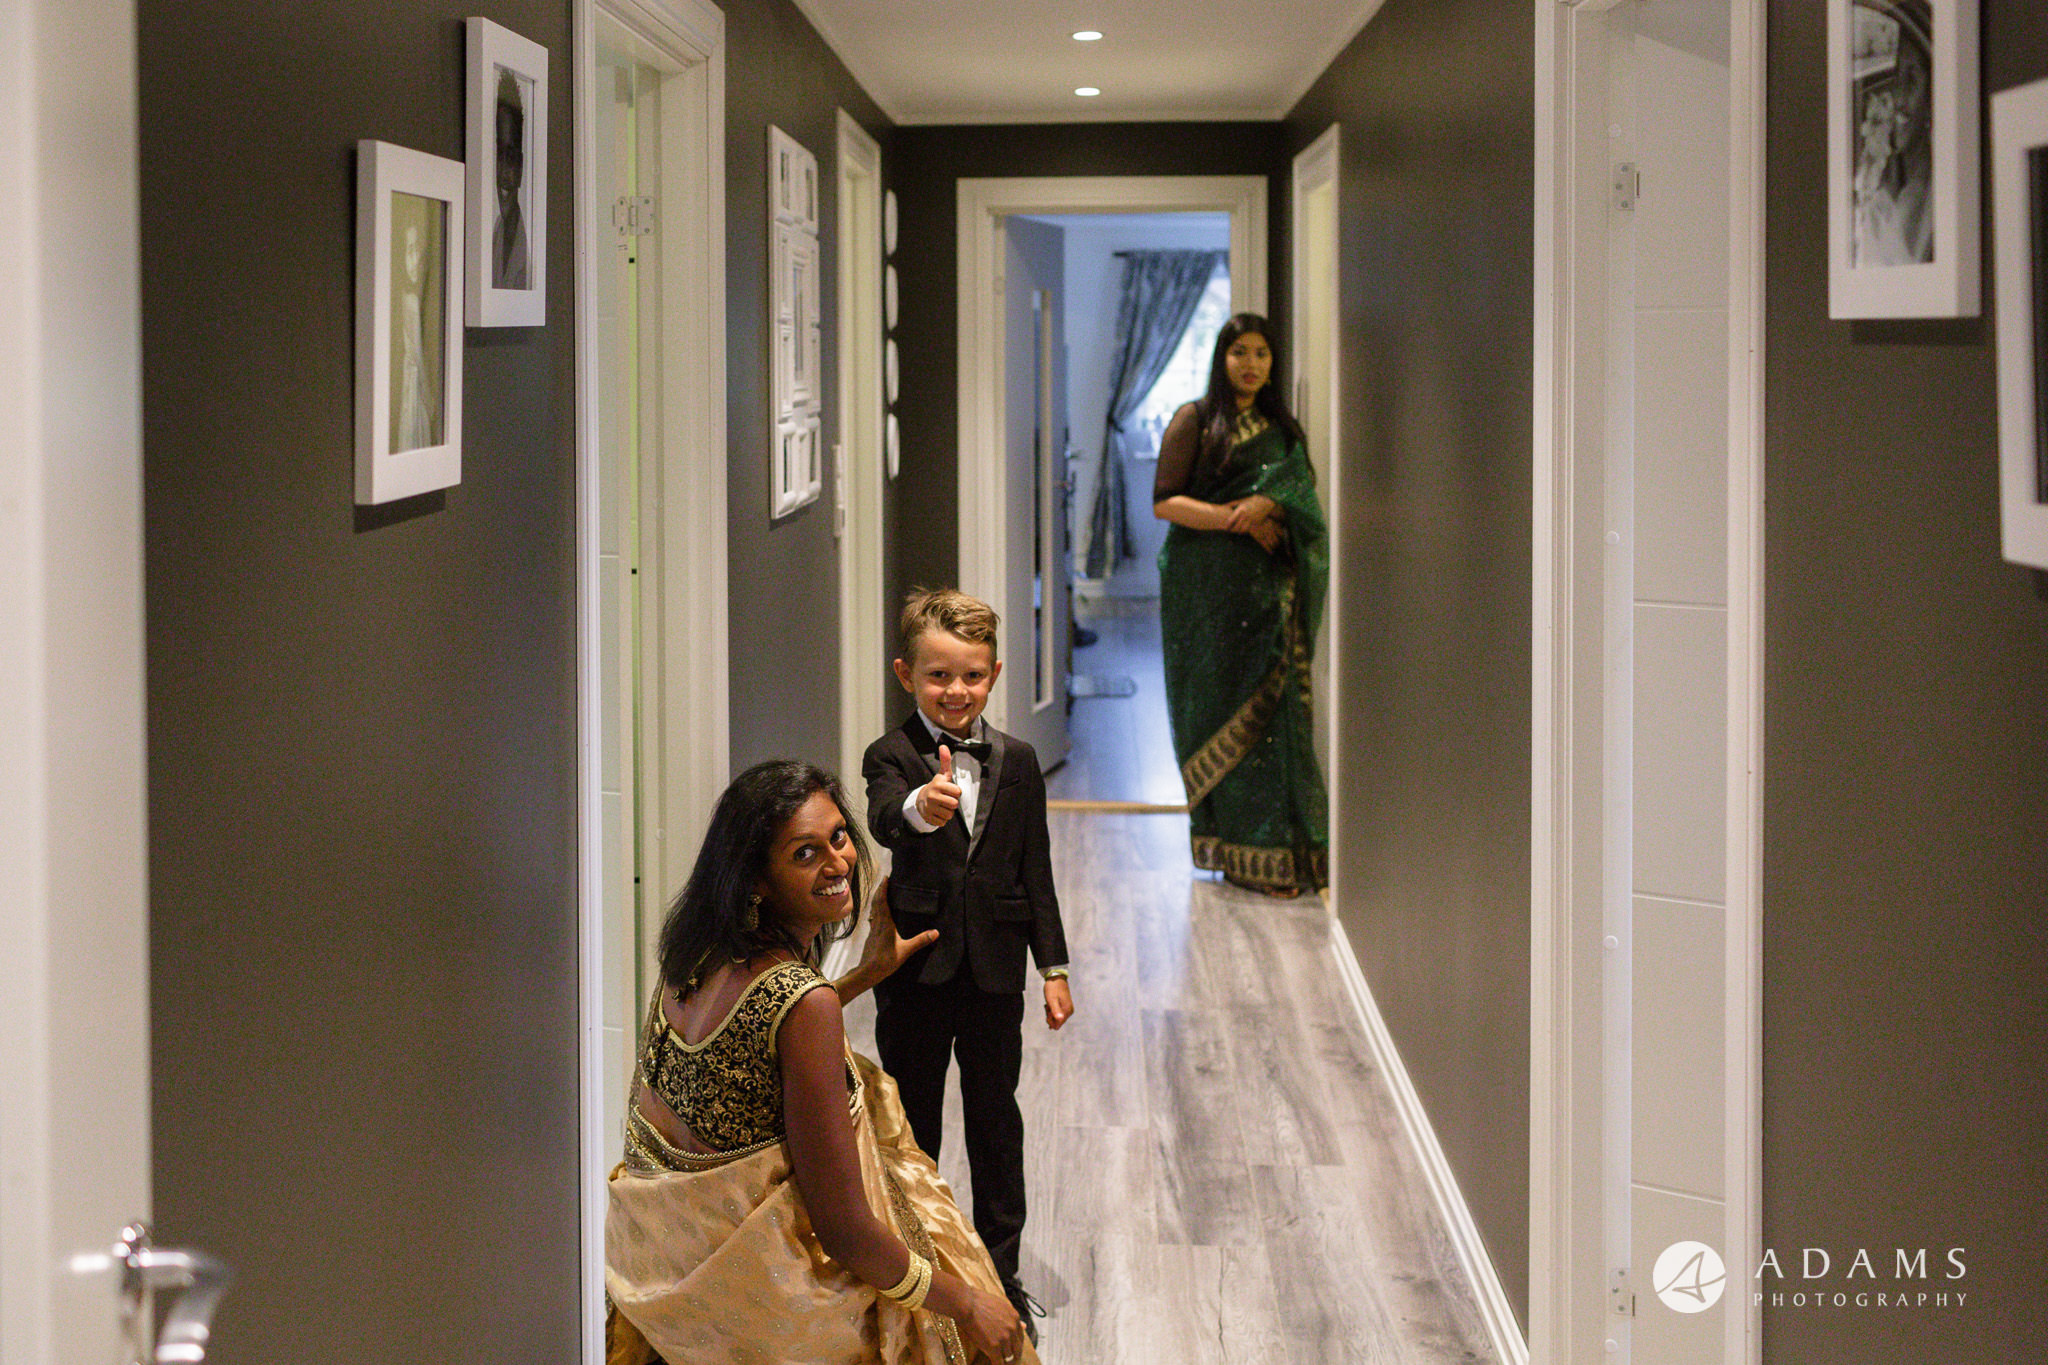 Oslo Wedding Photos Norway photo of the family in the corridor